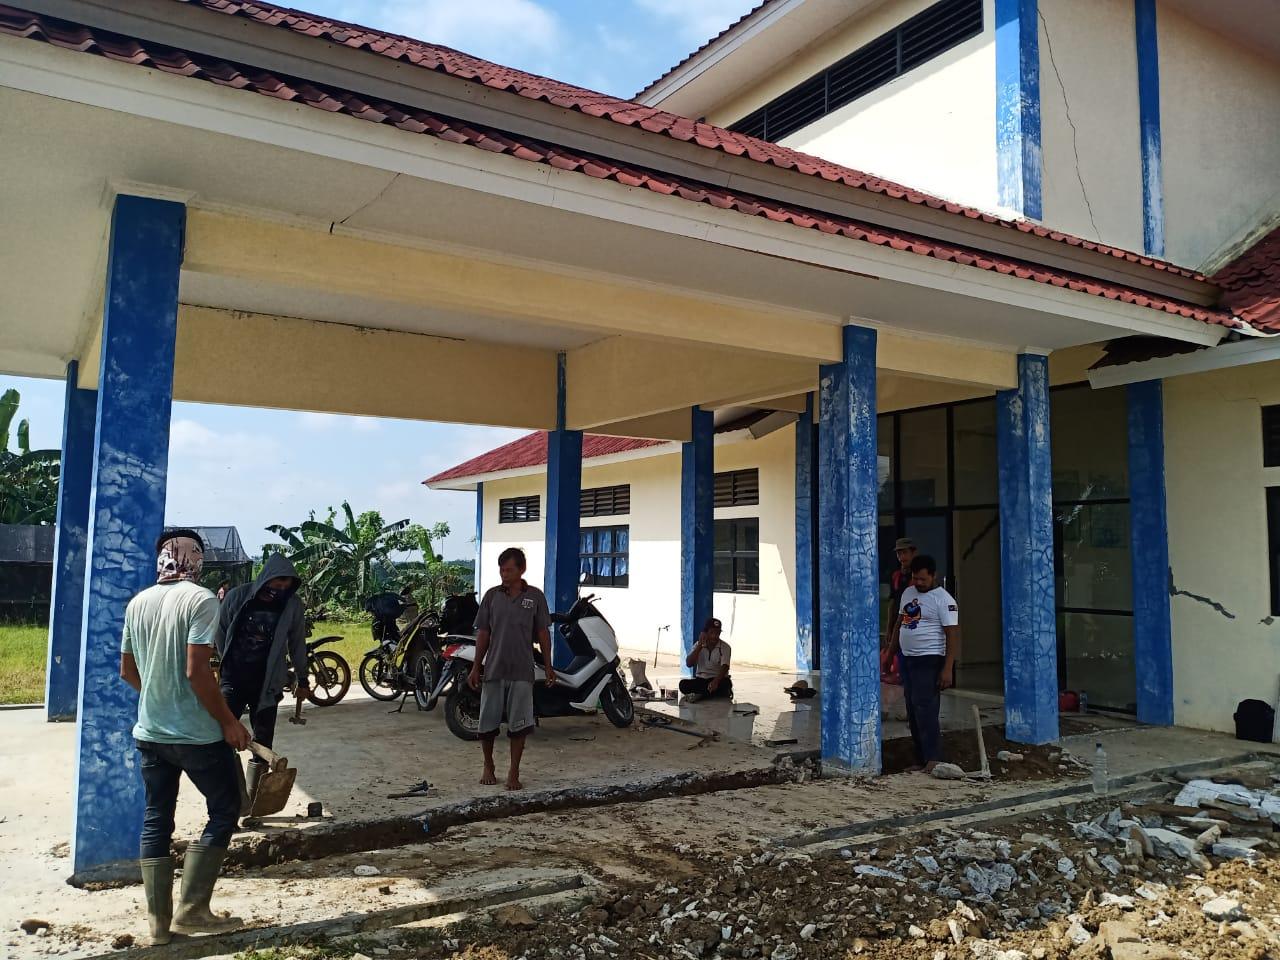 Gambar Tidak Mendapat Pembayaran Pekerjaan Perbaikan Gedung SMKN 14 Pandeglang, Kontraktor: Saya Akan Bongkar Lagi 15